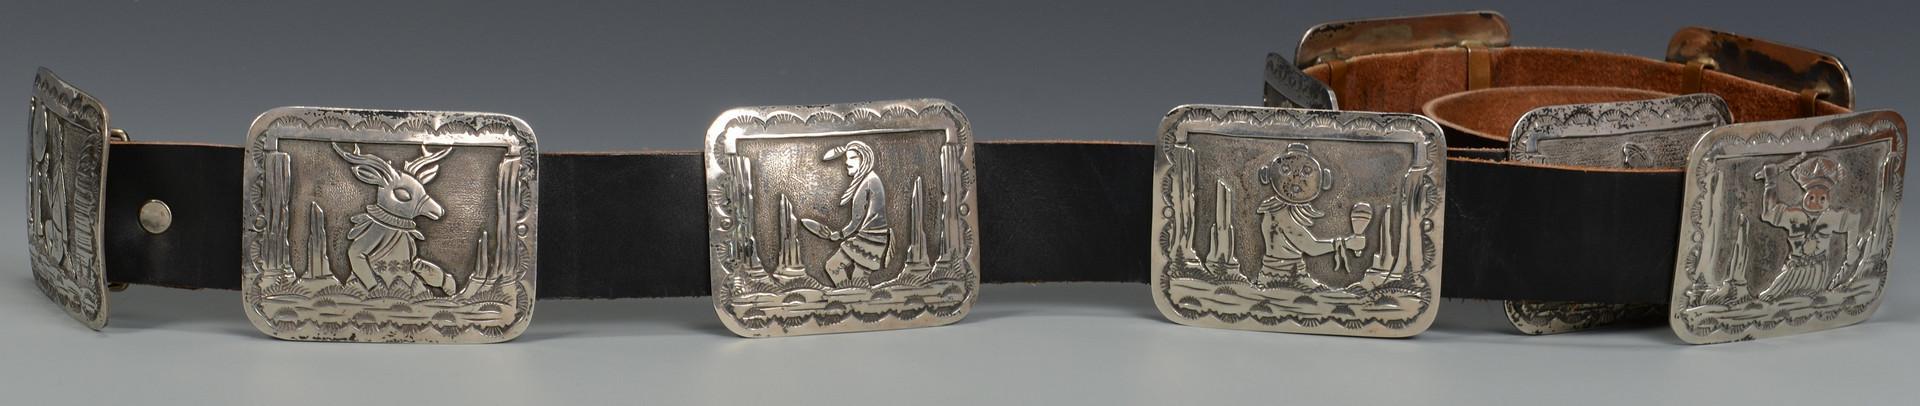 Lot 449: Two Native American Belts w/ sterling buckles